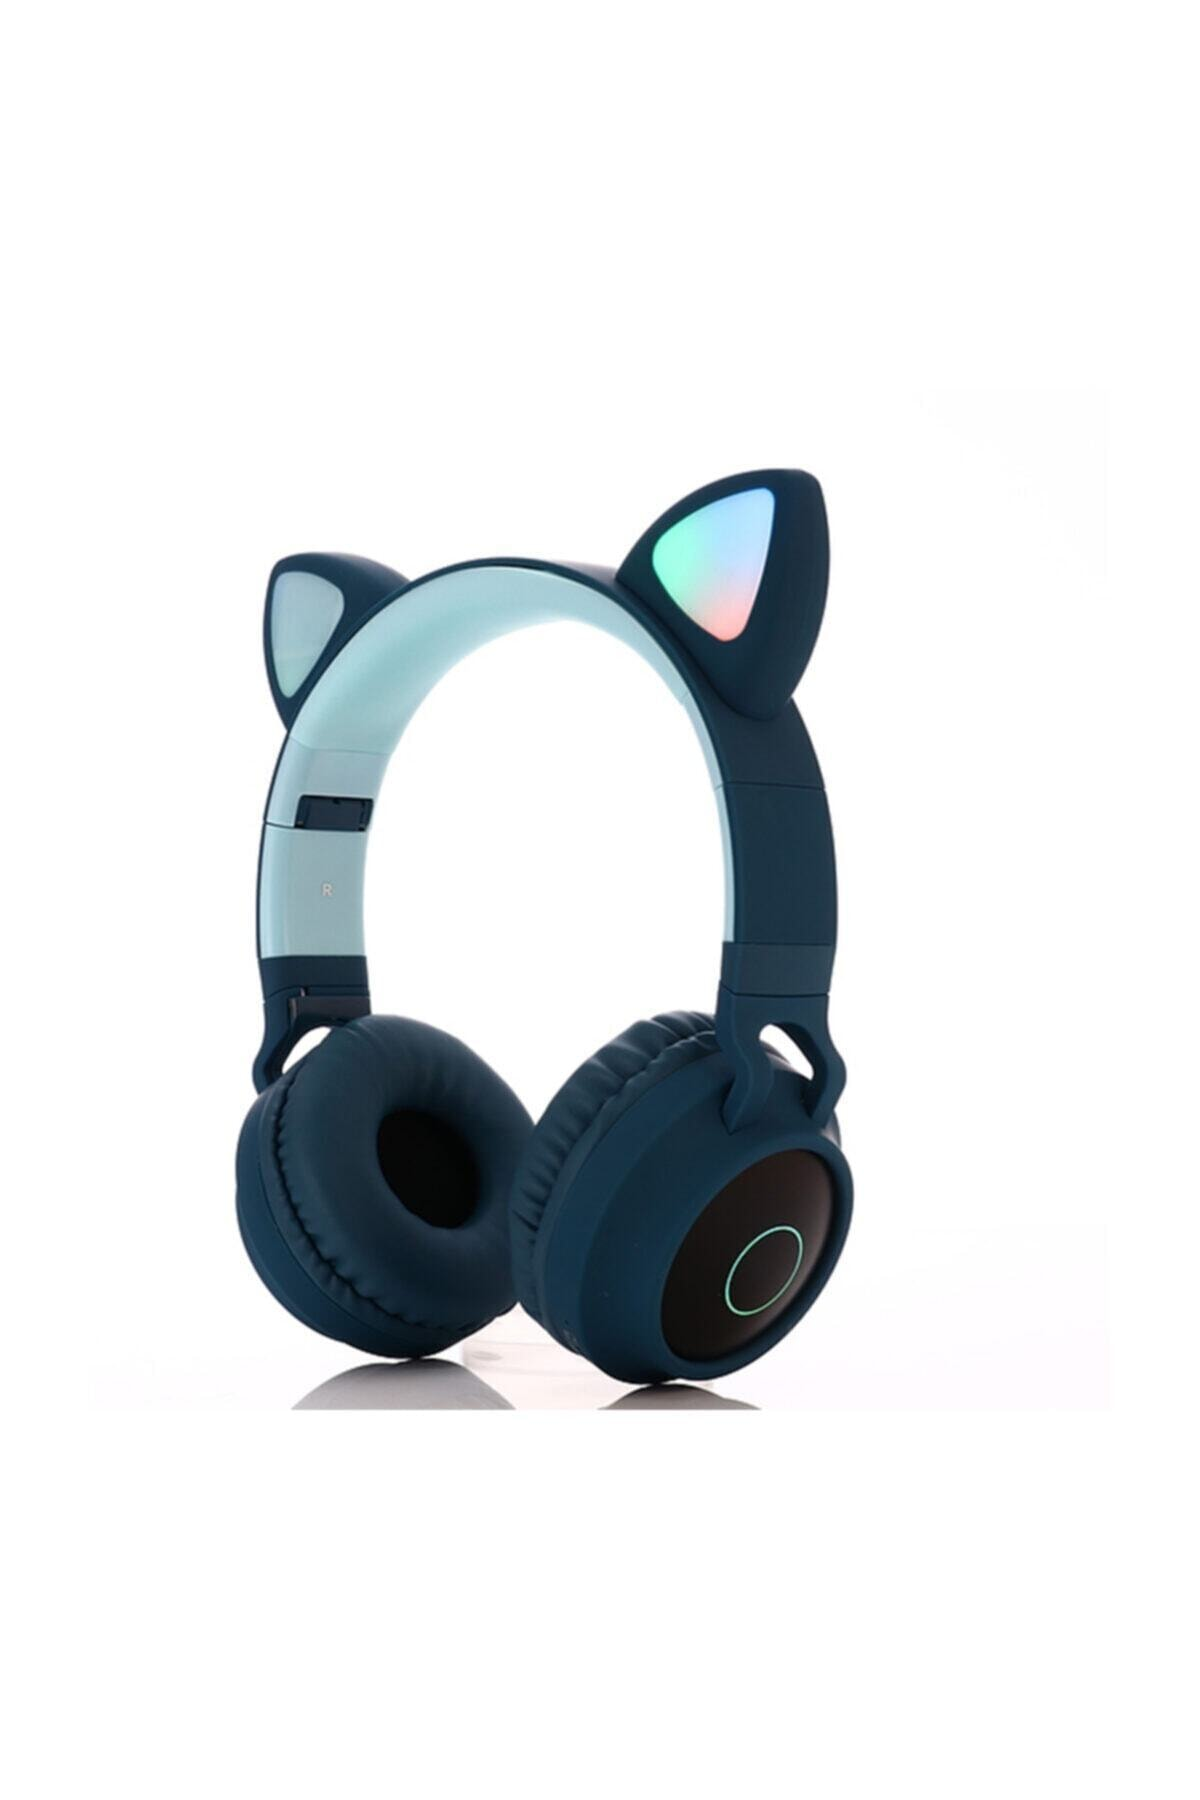 T&G-BT028C Kablosuz Bluetooth 5.0 Stereo Yüksek Ses Akıllı LED Kulaklık